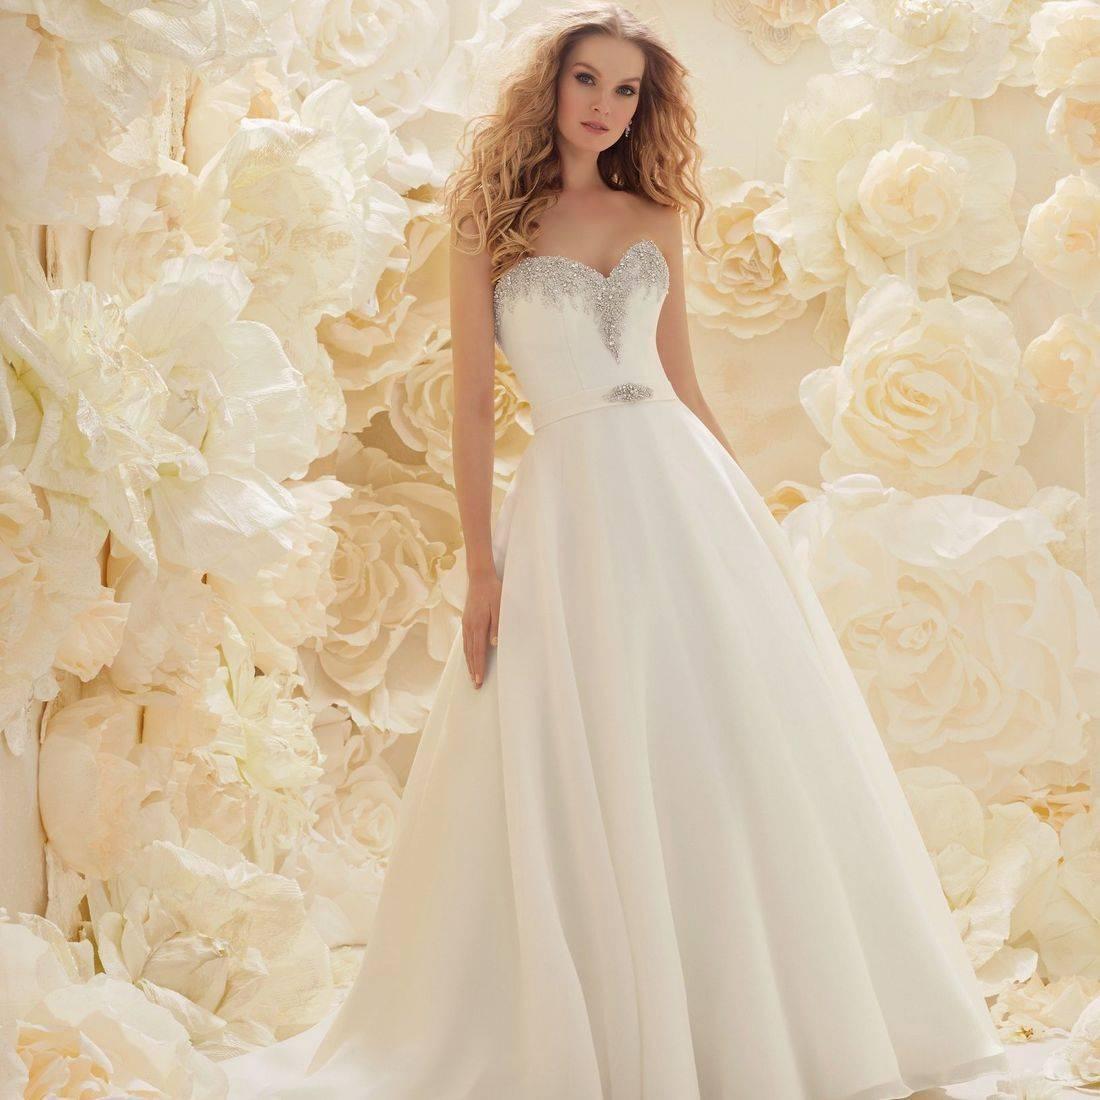 Ronald Joyce wedding dresses, stunning wedding dress,  Sicilia Sofia Bianca by Ronald Joyce, Aline wedding dress, satin wedding dress